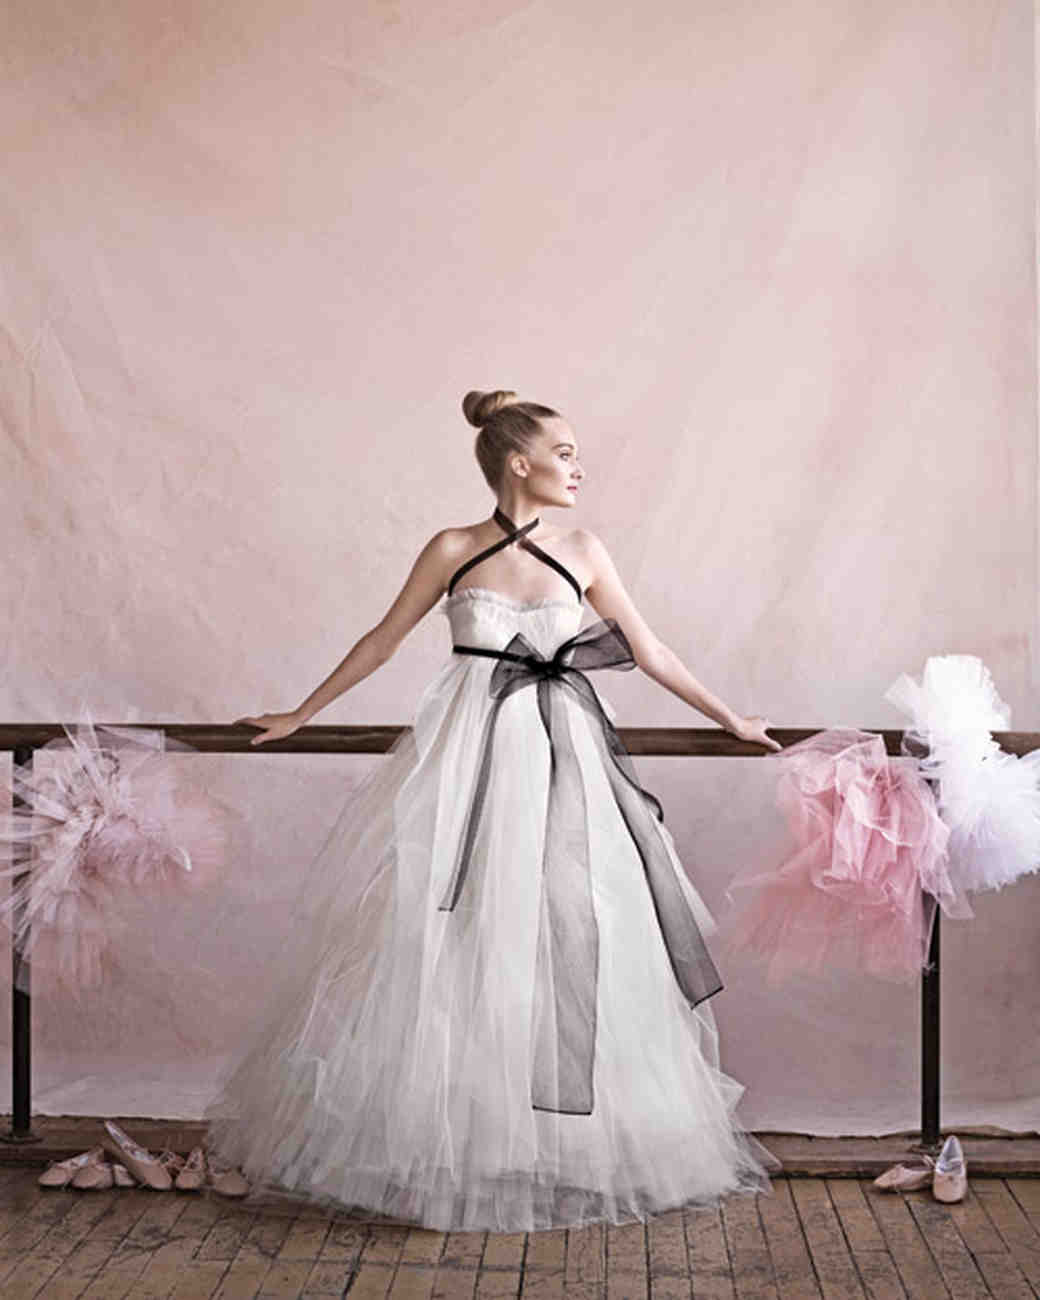 40 Fashion inspired wedding photography